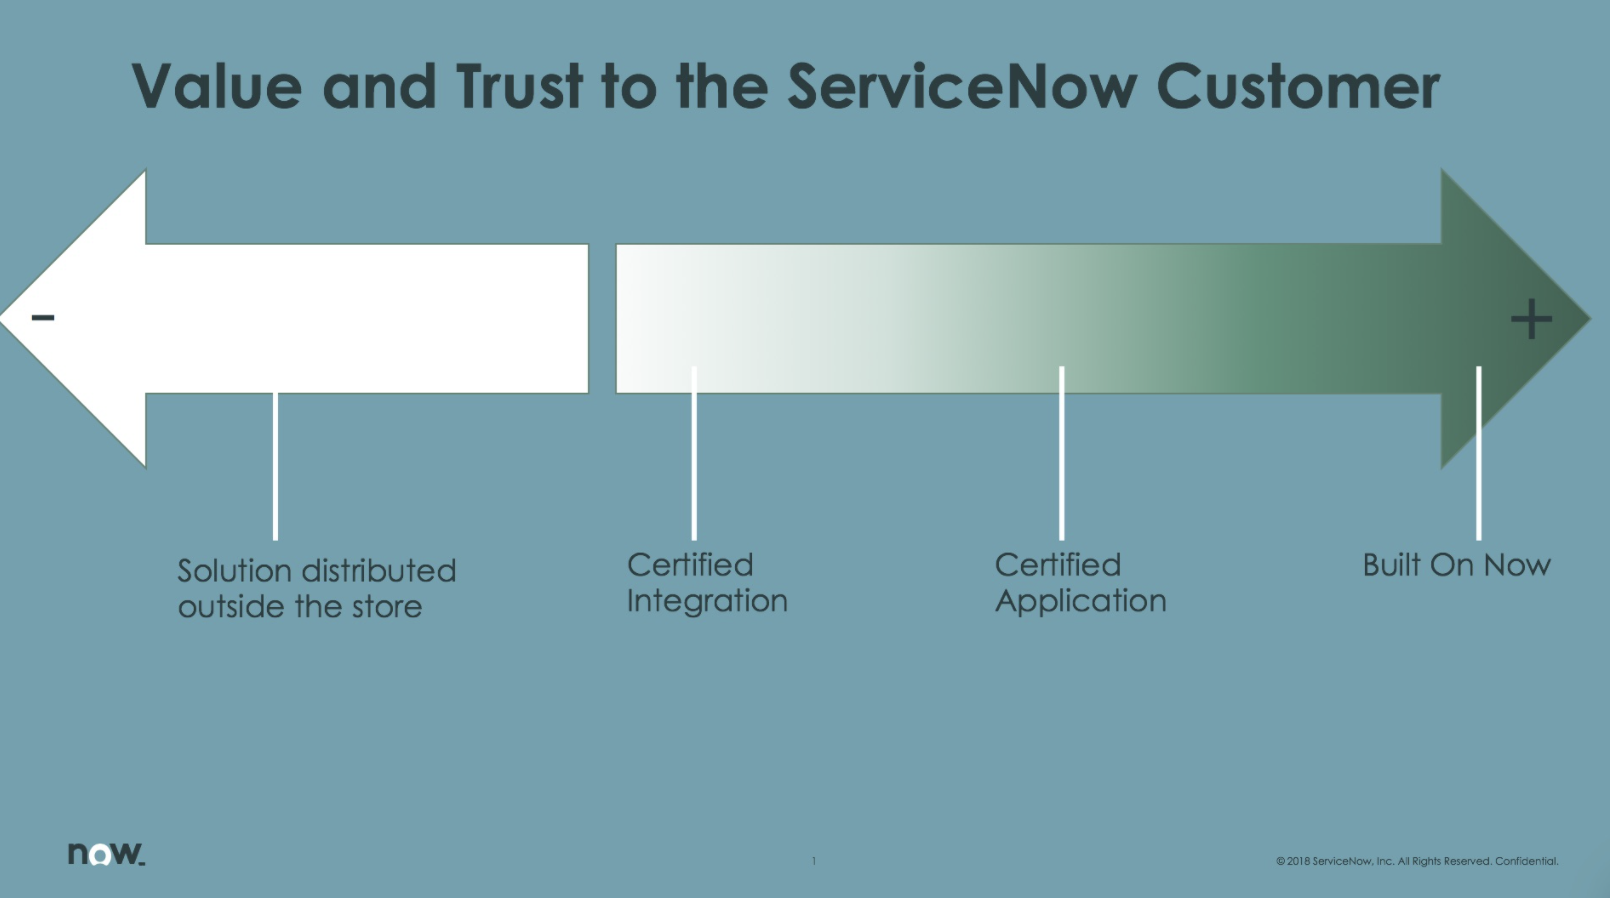 Value & Trust - ServiceNow Customer